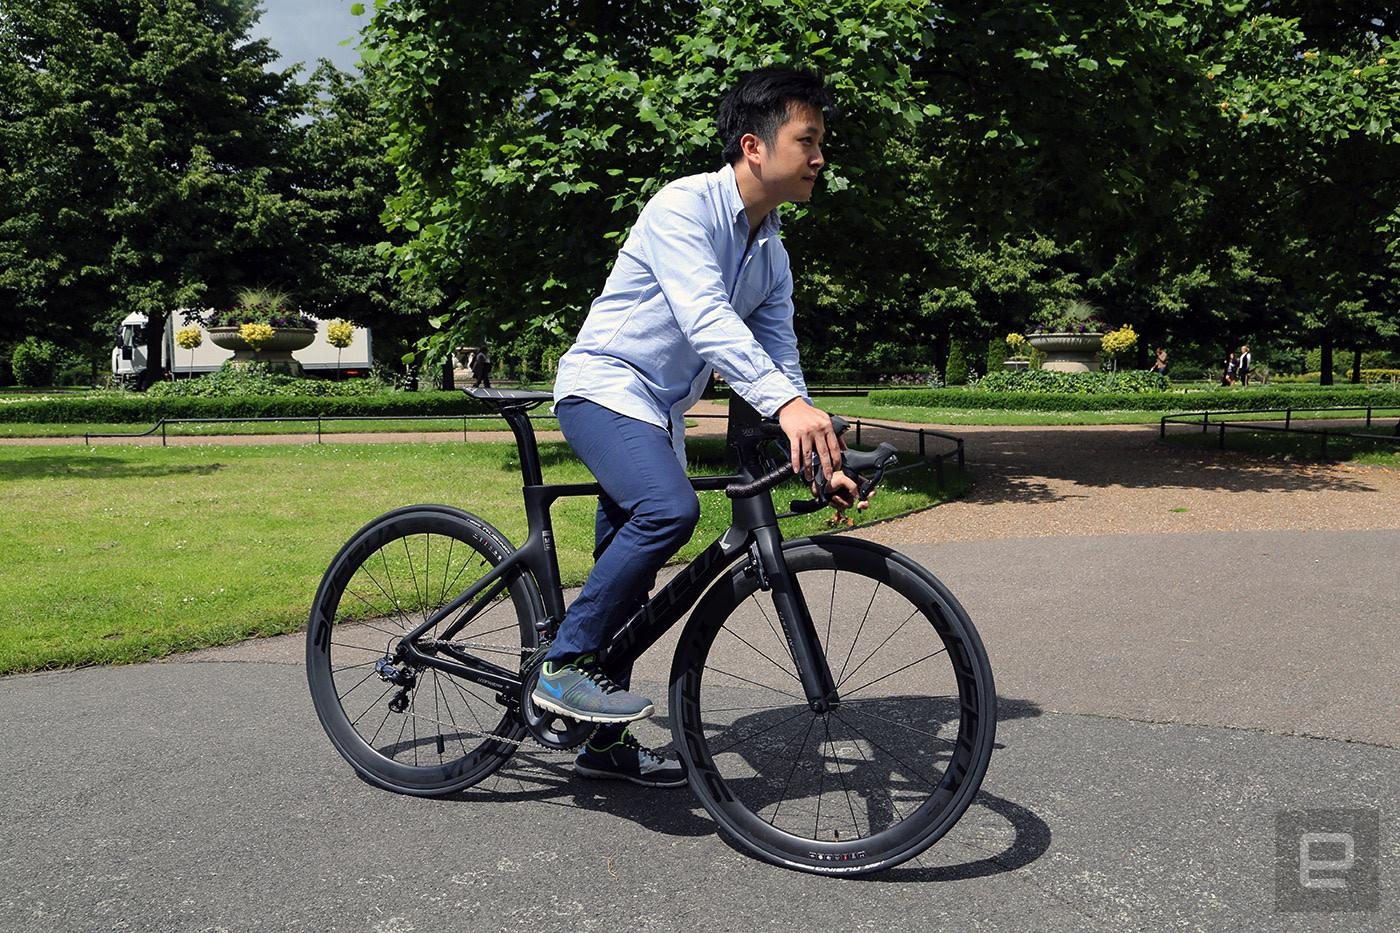 Riding The Speedx Leopard  A Smarter Carbon Road Bike